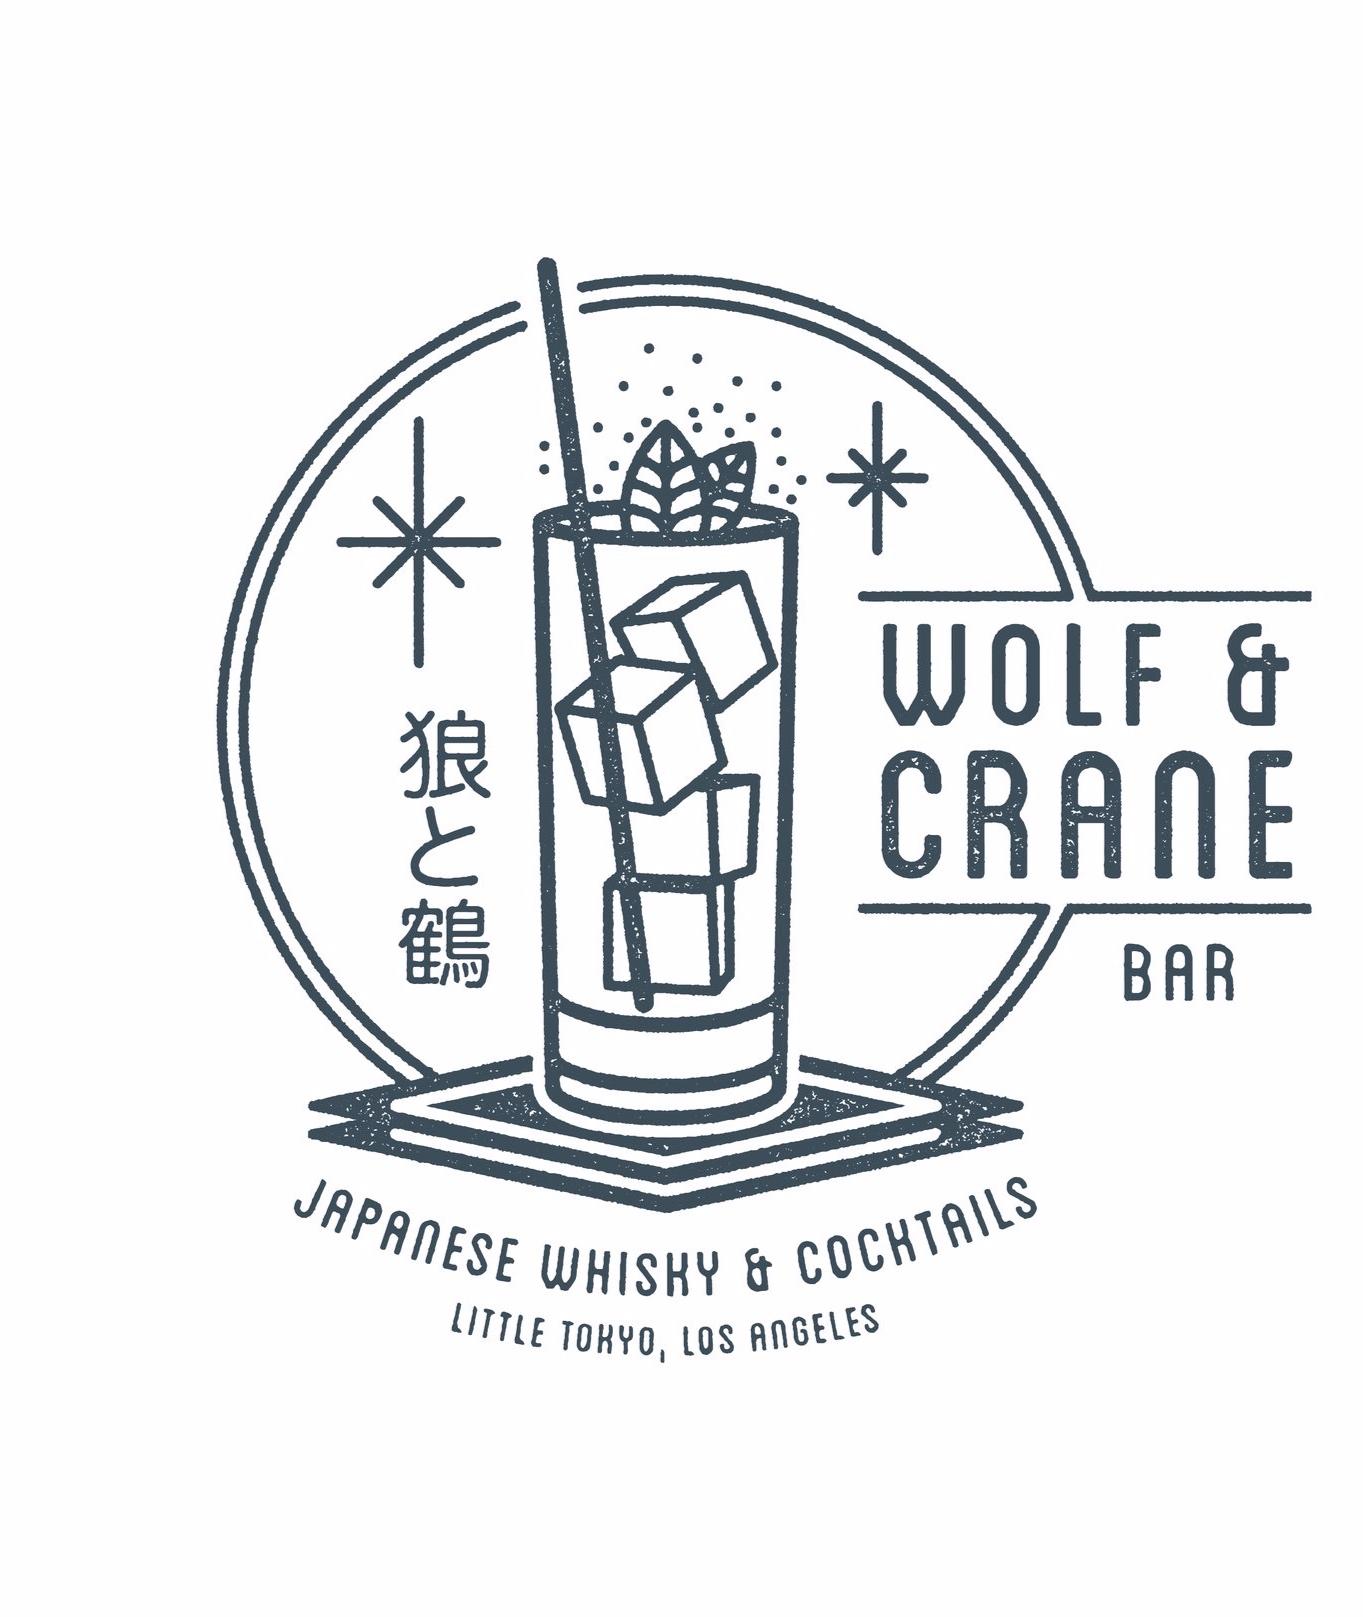 Wolf%26Crane-TeeDesign-01.jpg